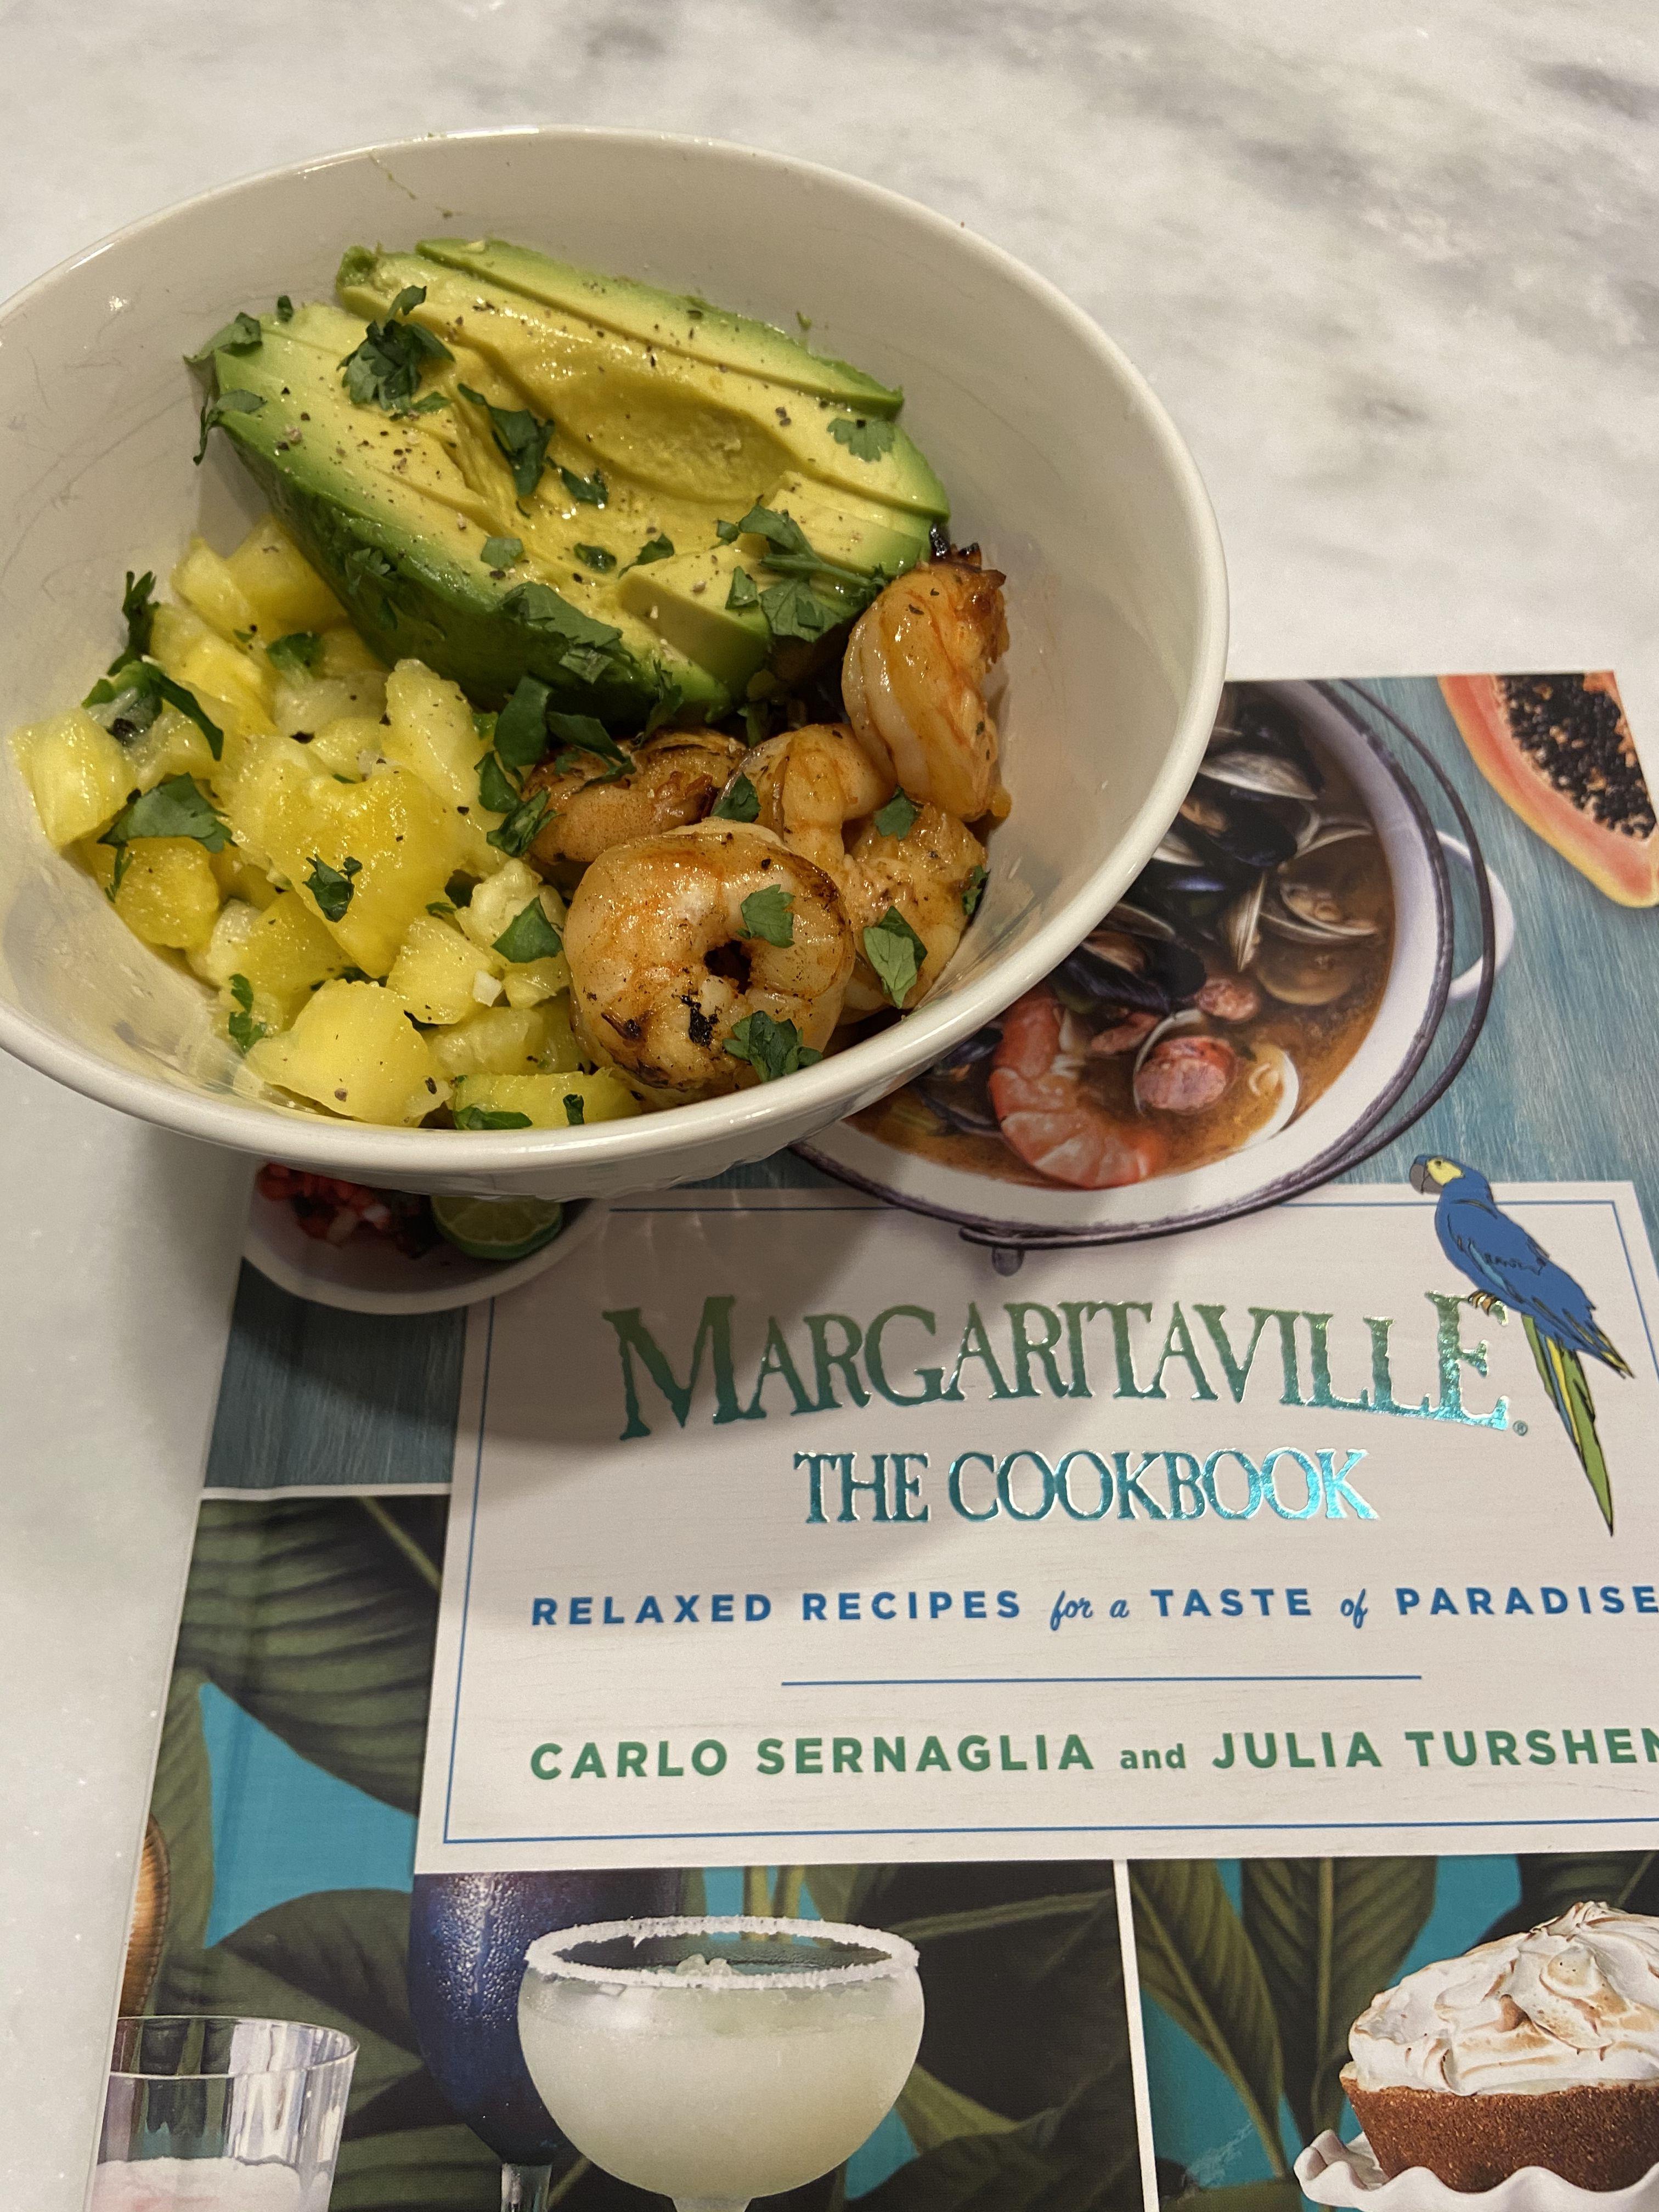 Margarita Shrimp Quinoa Bowl With Pineapple Salsa And Avocado Fruit Salsa Shrimp And Quinoa Pineapple Salsa